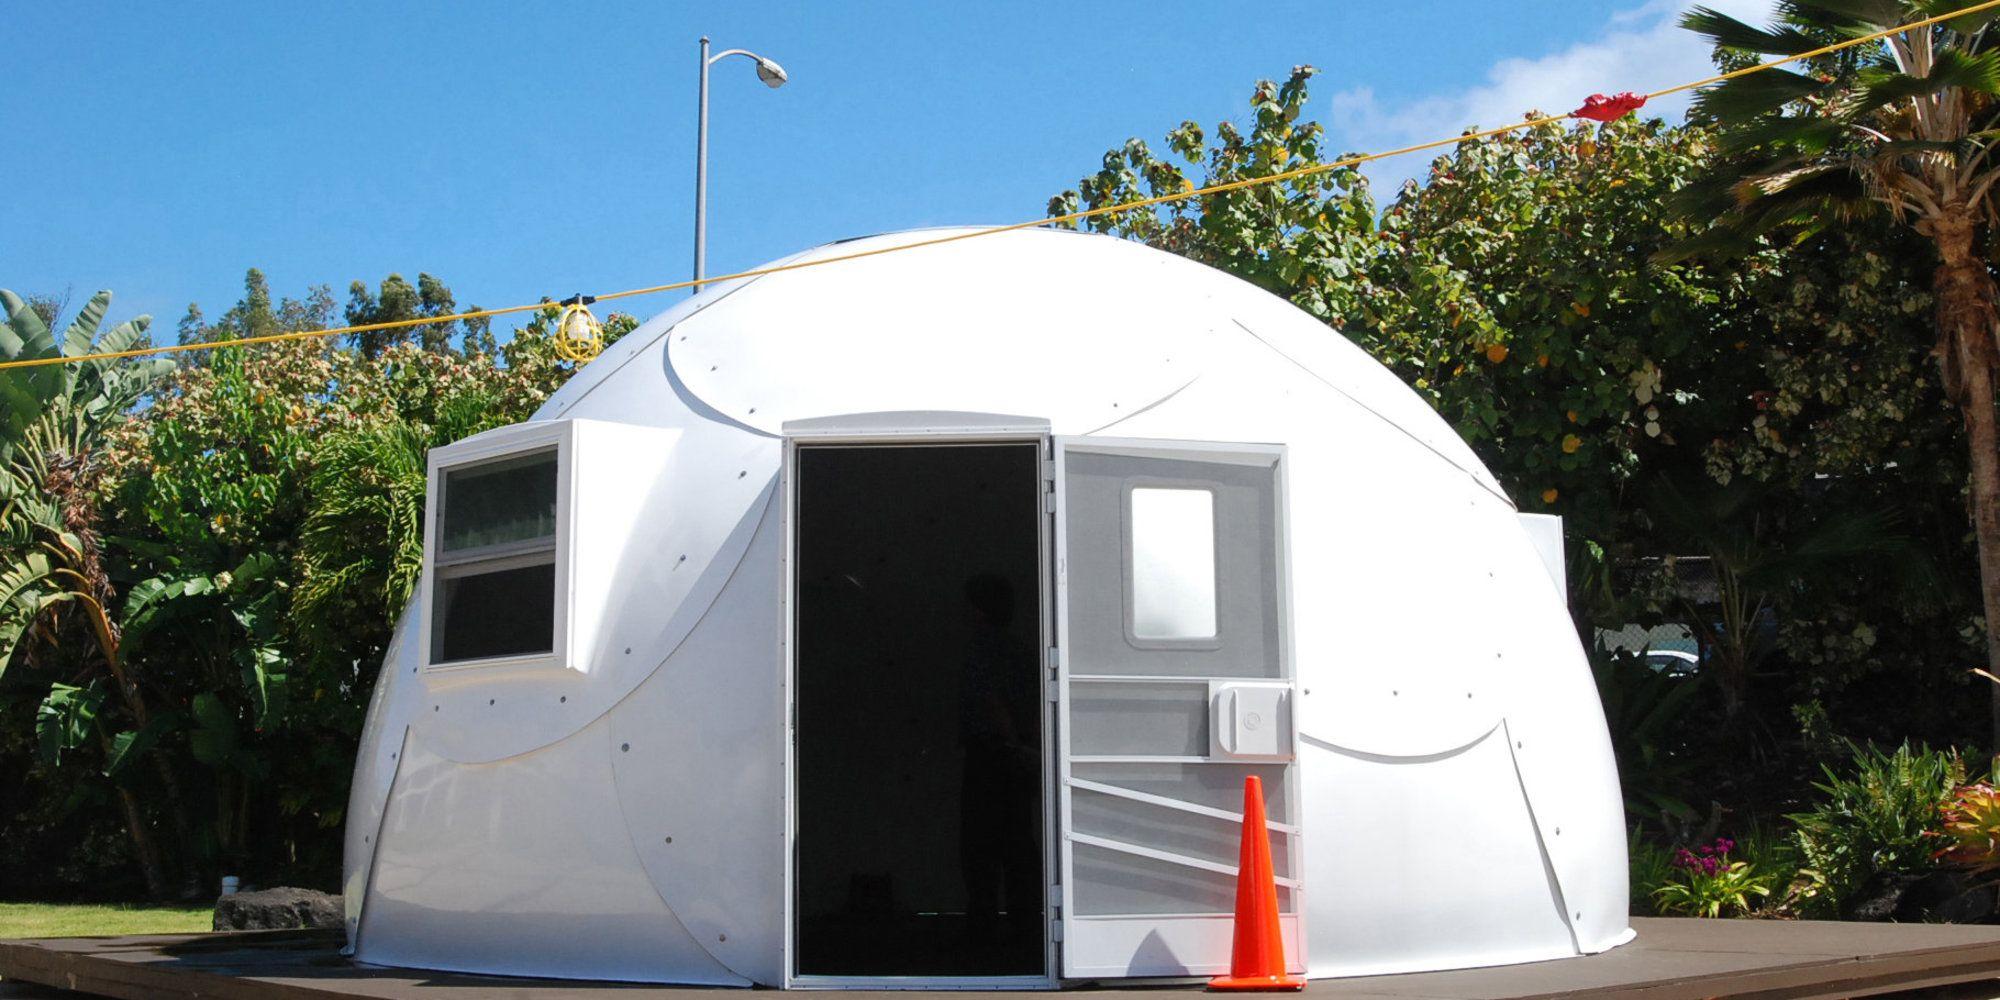 Hawaii Is Using Igloos To House Homeless Dome House Homeless Housing Homeless Families